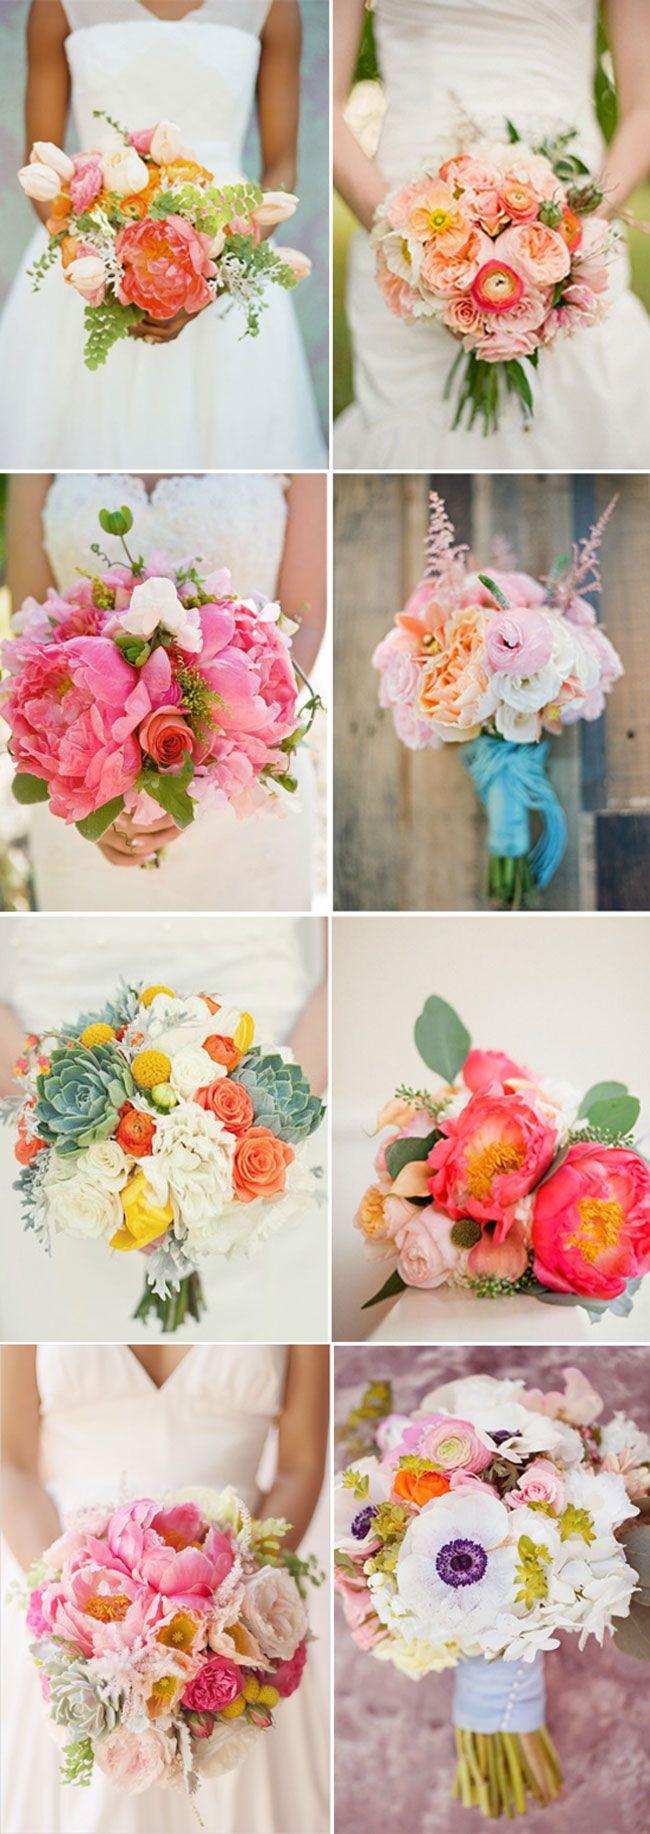 Bouquet ideas for the summer bride #weddings